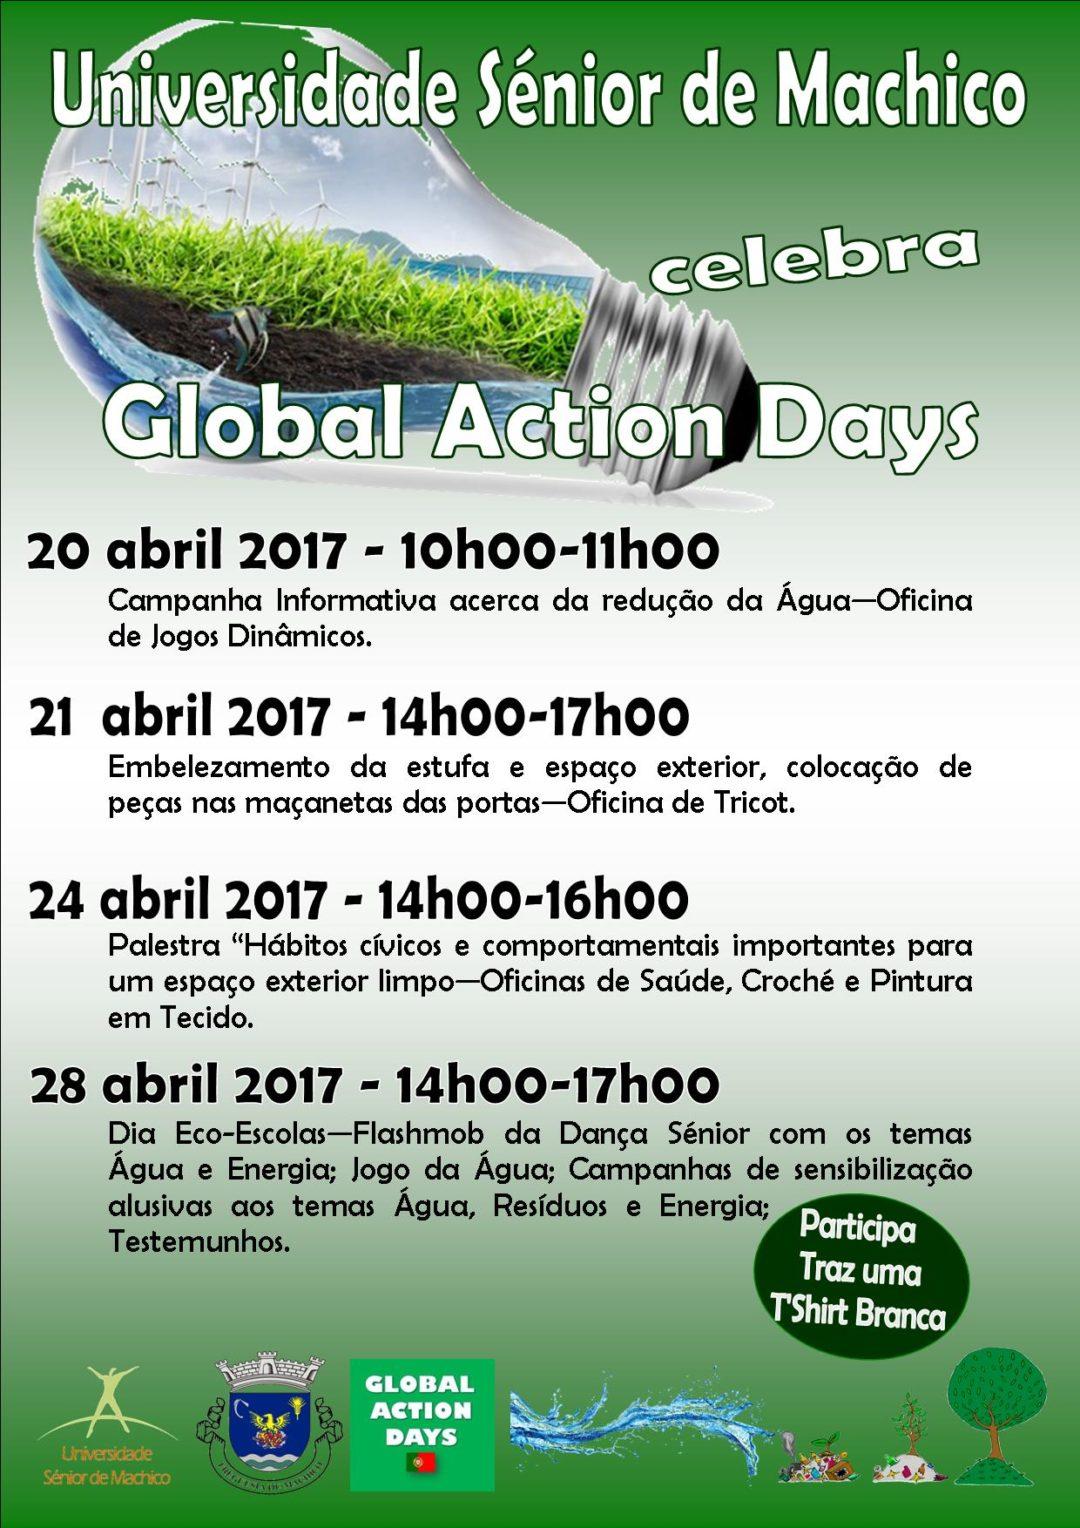 Global Action Days  2017 – Universidade Sénior de Machico